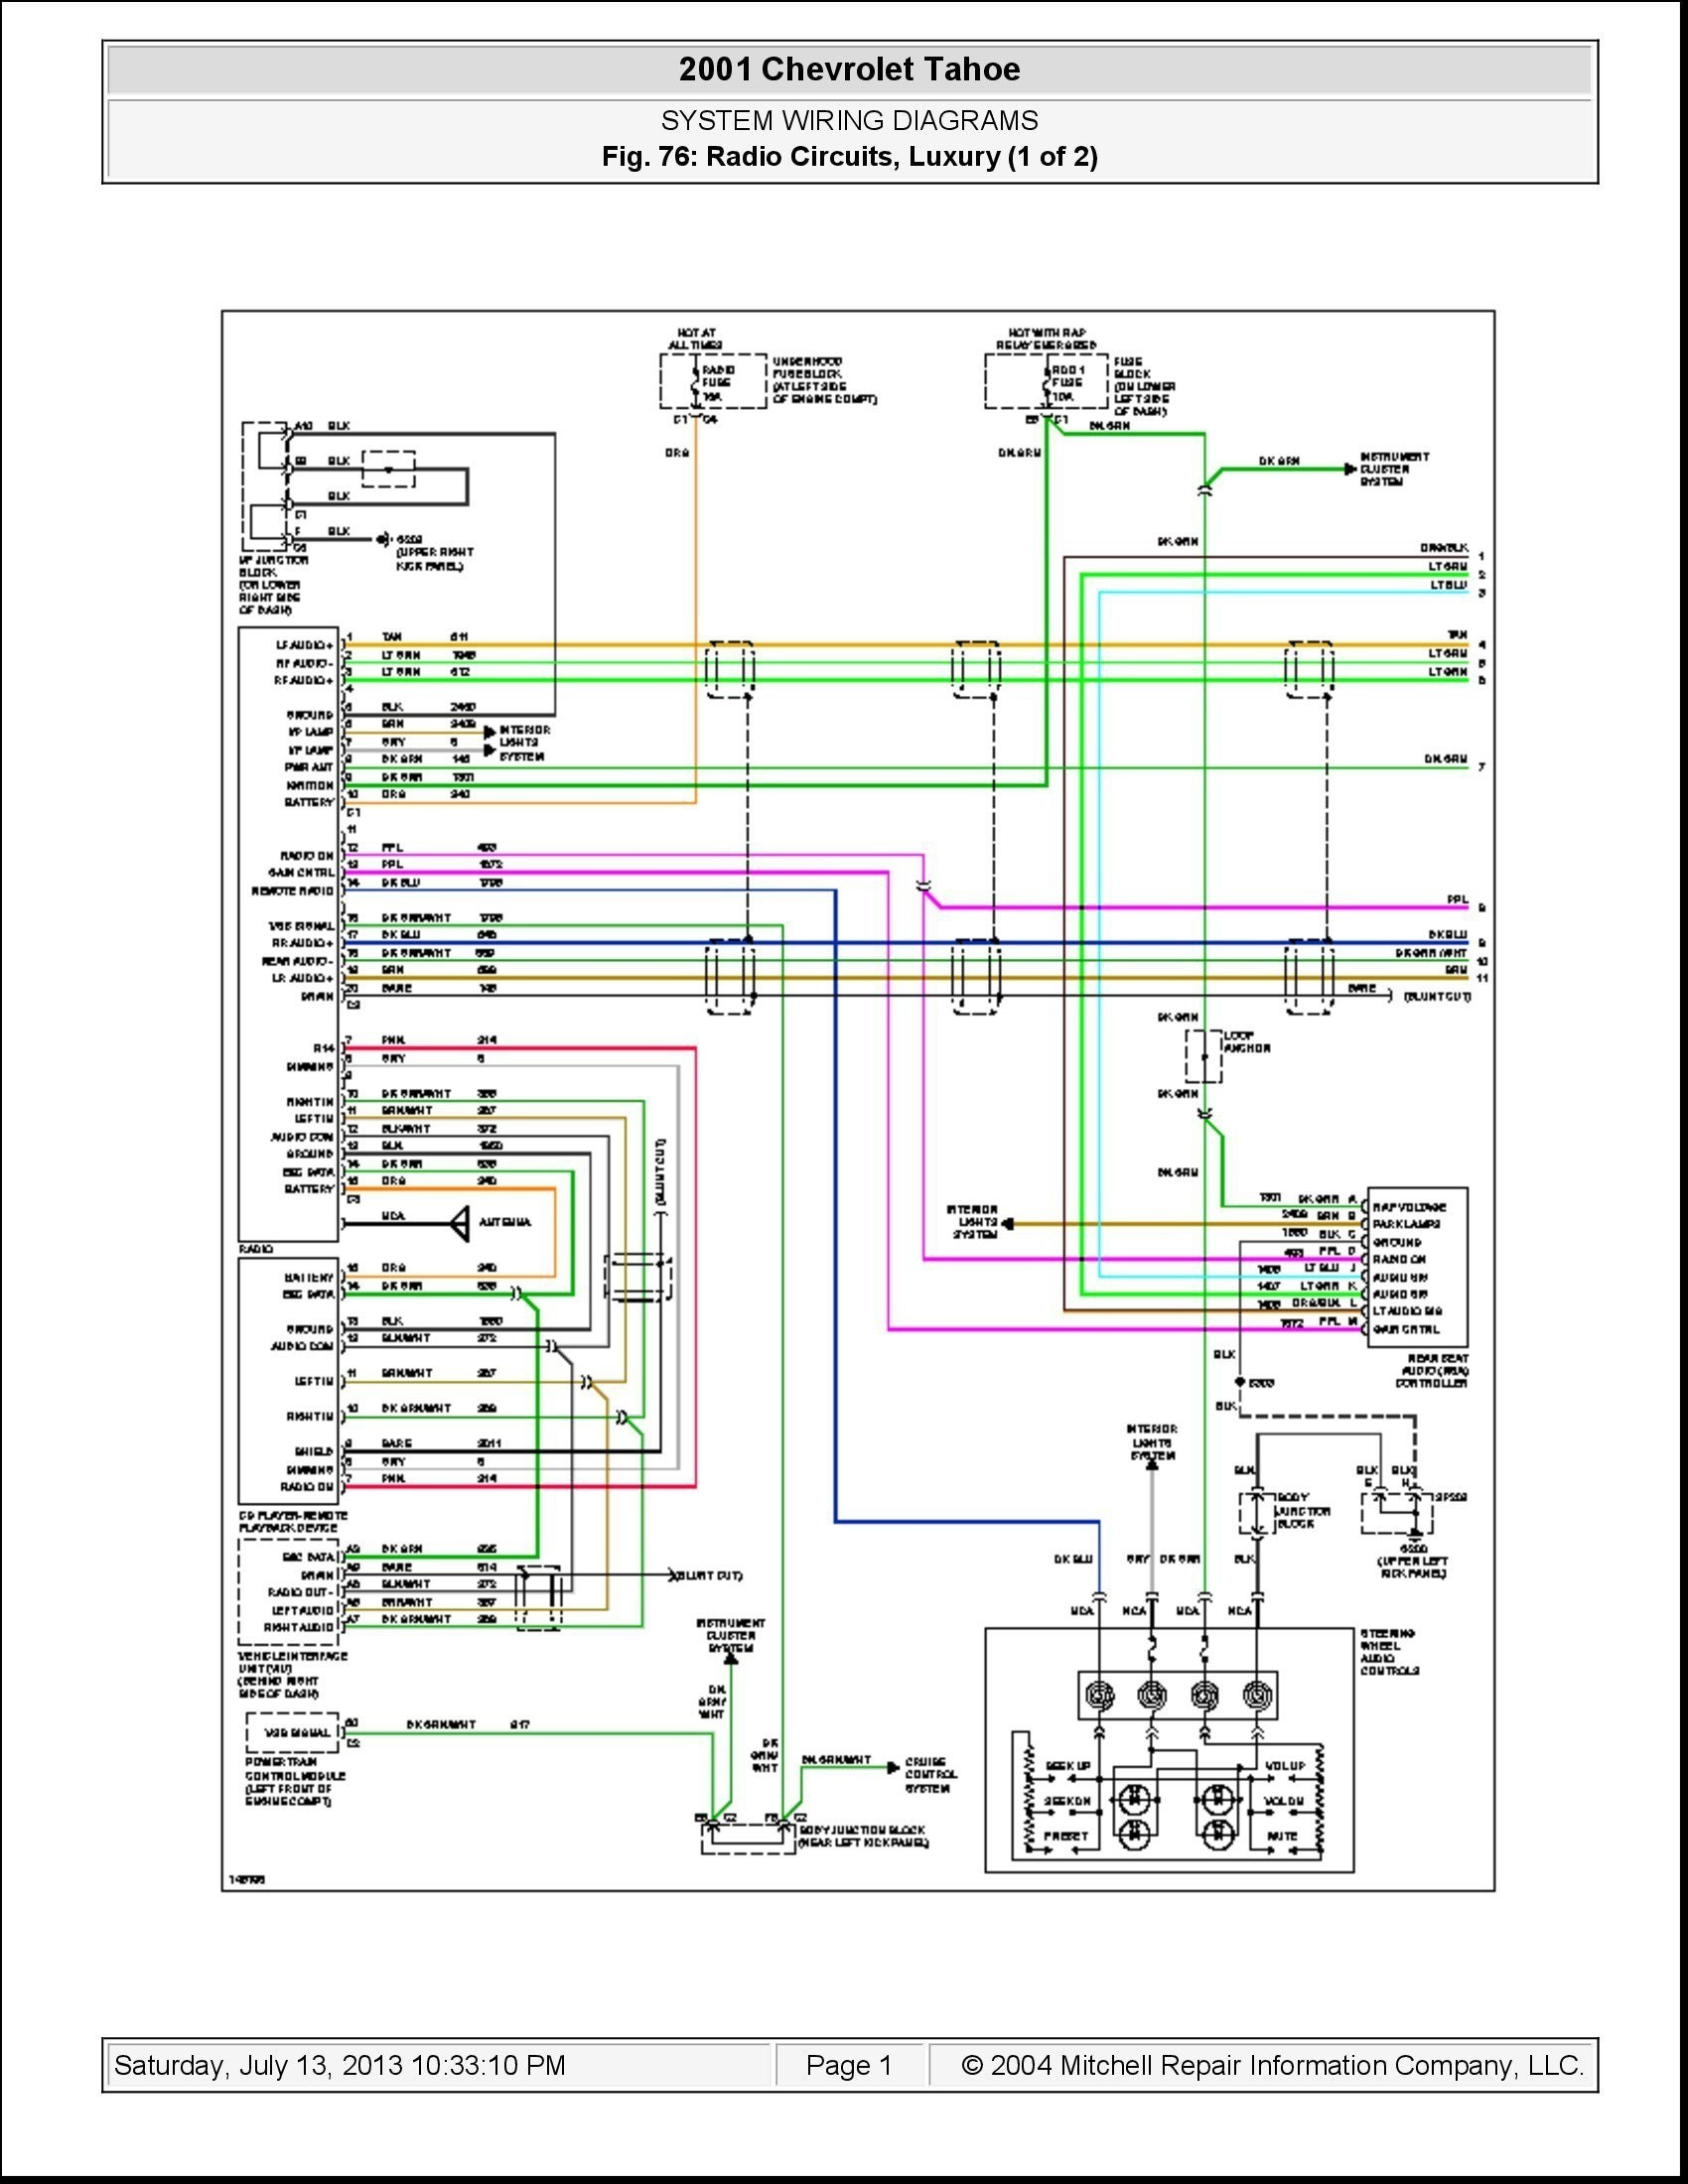 Stereo Wiring Harness For 2001 Camaro - Wiring Diagrams Name  key-satisfaction - key-satisfaction.illabirintodellacreativita.it | 98 Camaro Radio Wiring Diagram |  | key-satisfaction.illabirintodellacreativita.it